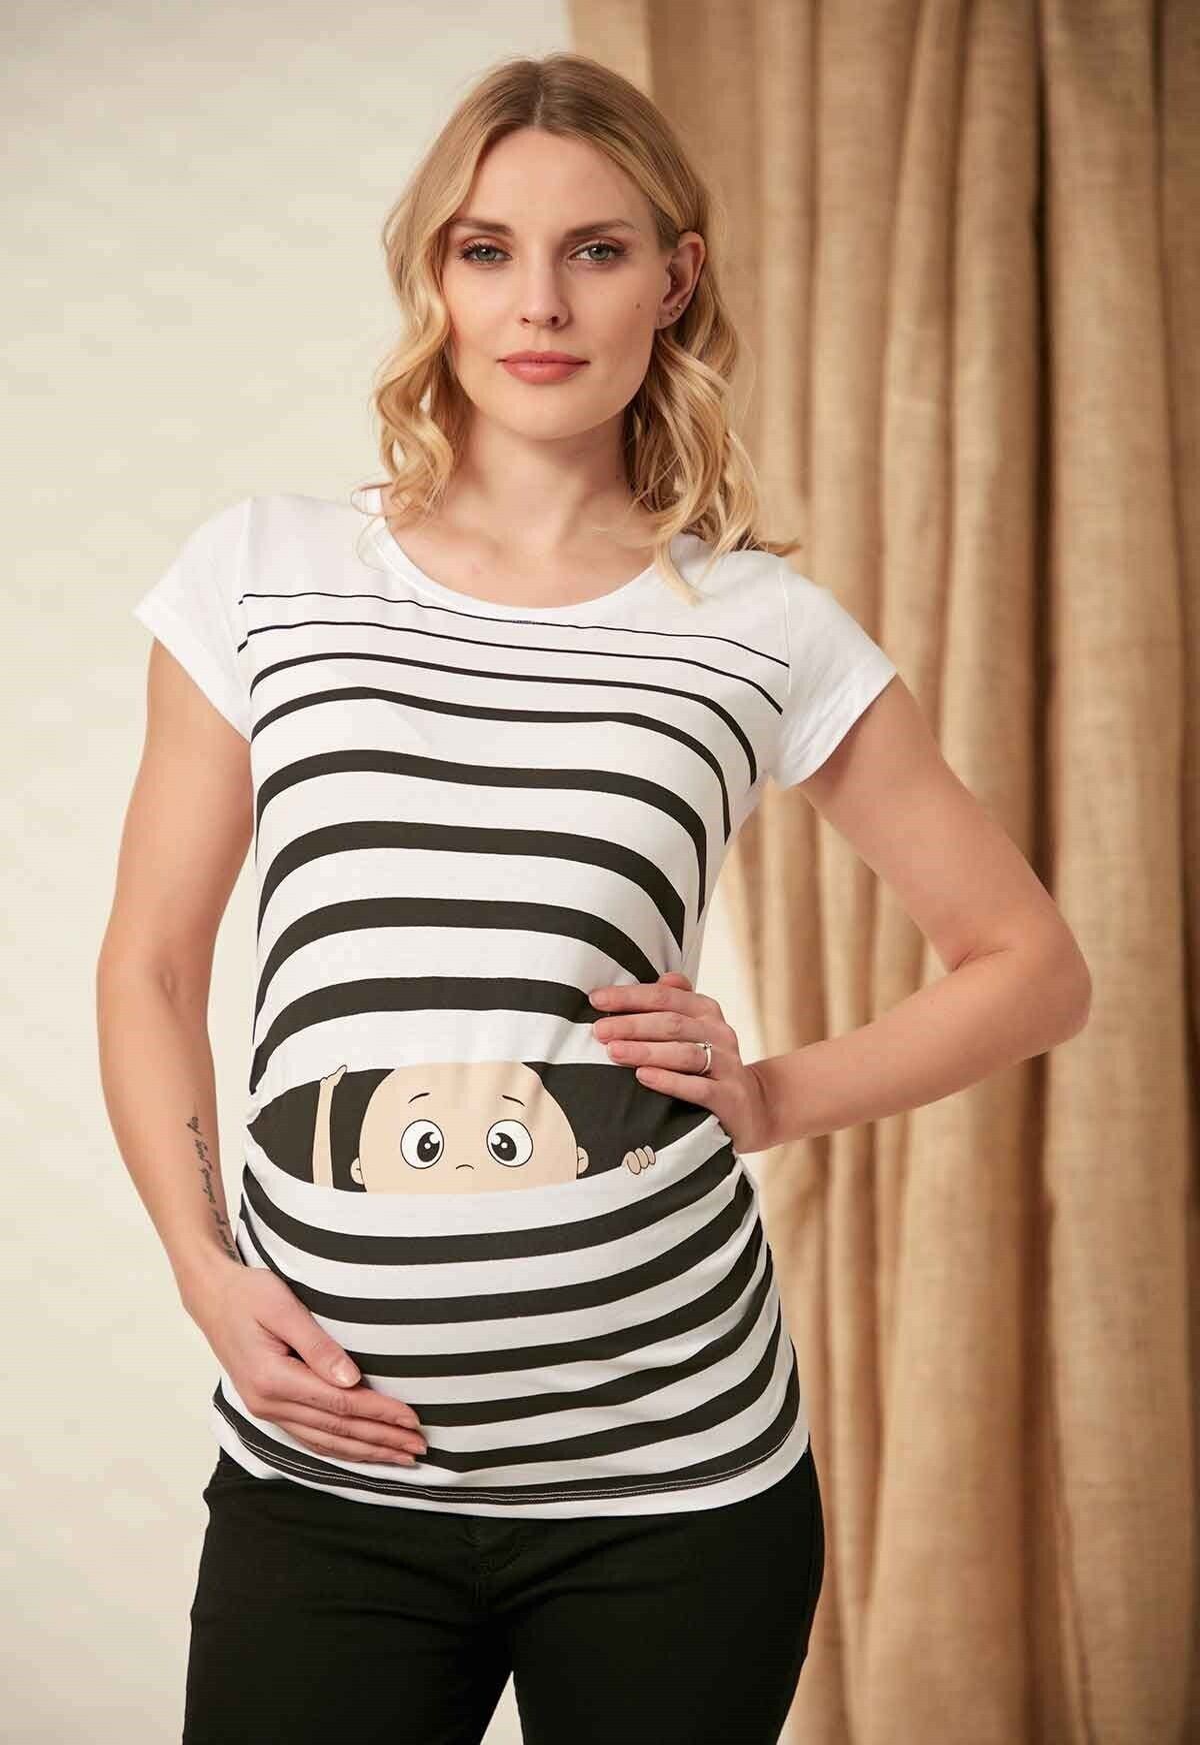 image تی شرت تیشرت بارداری کودک چاپی سفید برند Gör&Sin کد 1613197262